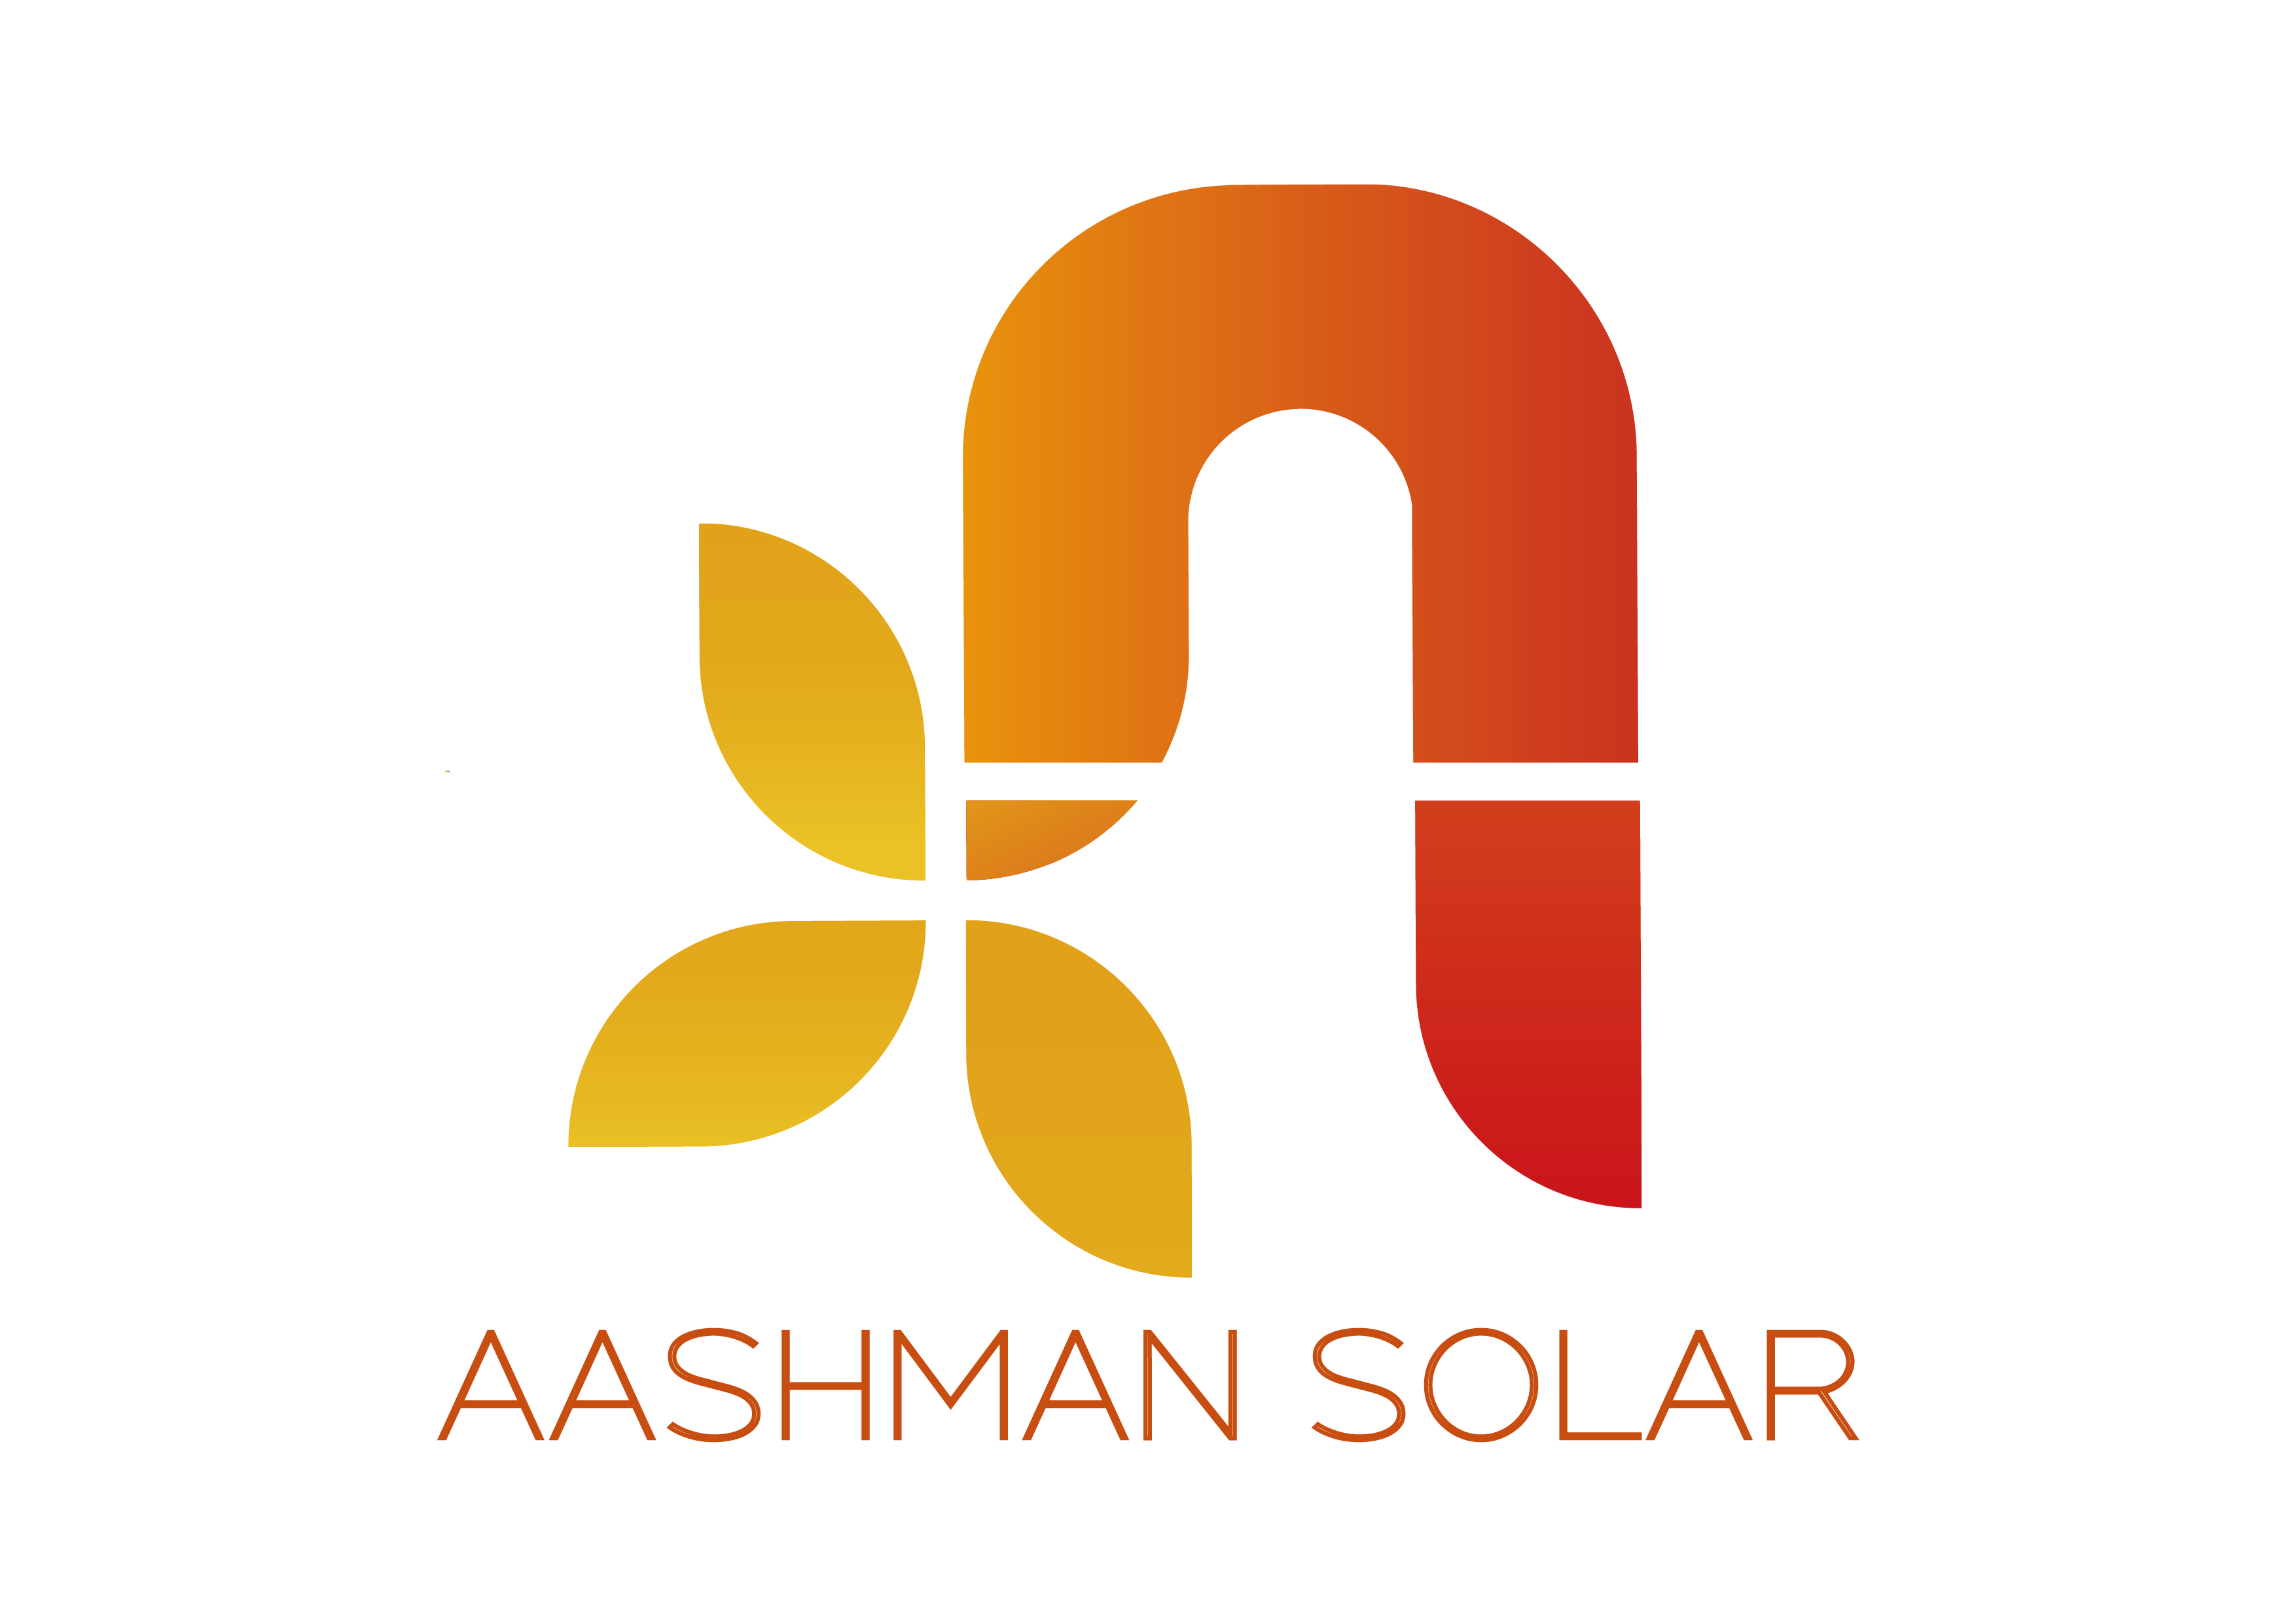 Aashman Solar Pvt Ltd